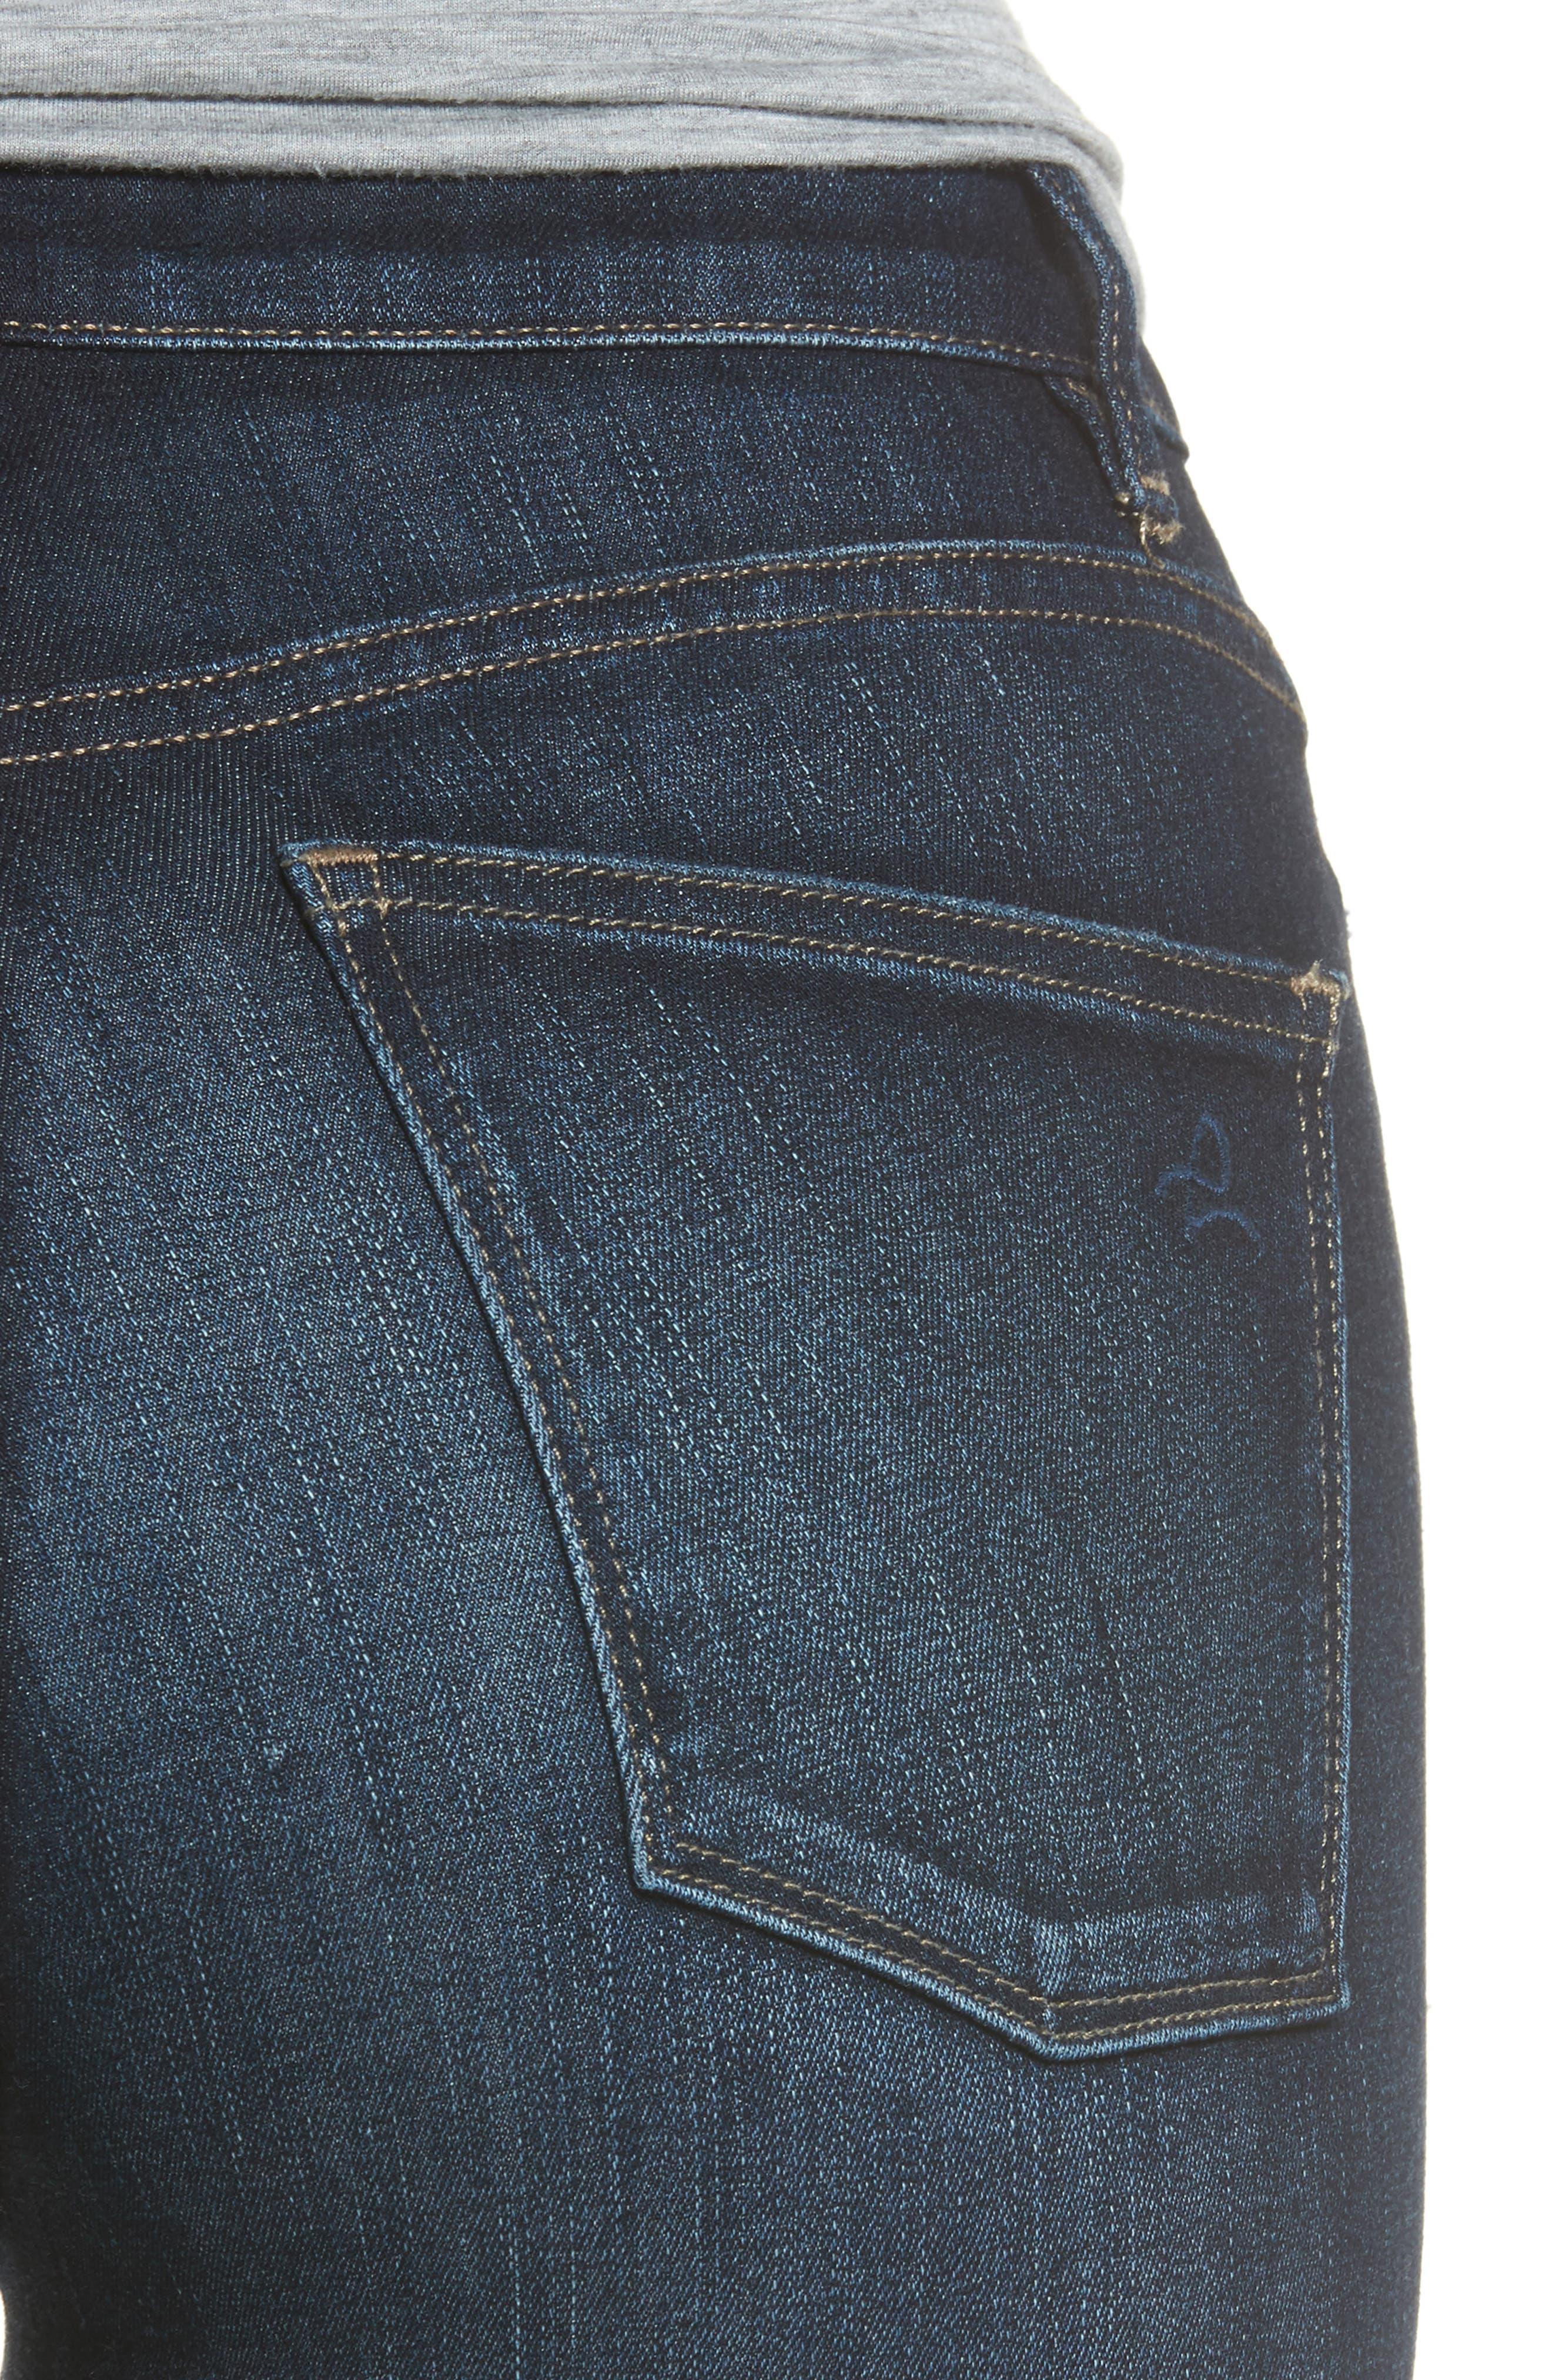 Chrissy High Waist Crop Skinny Jeans,                             Alternate thumbnail 4, color,                             Trinity